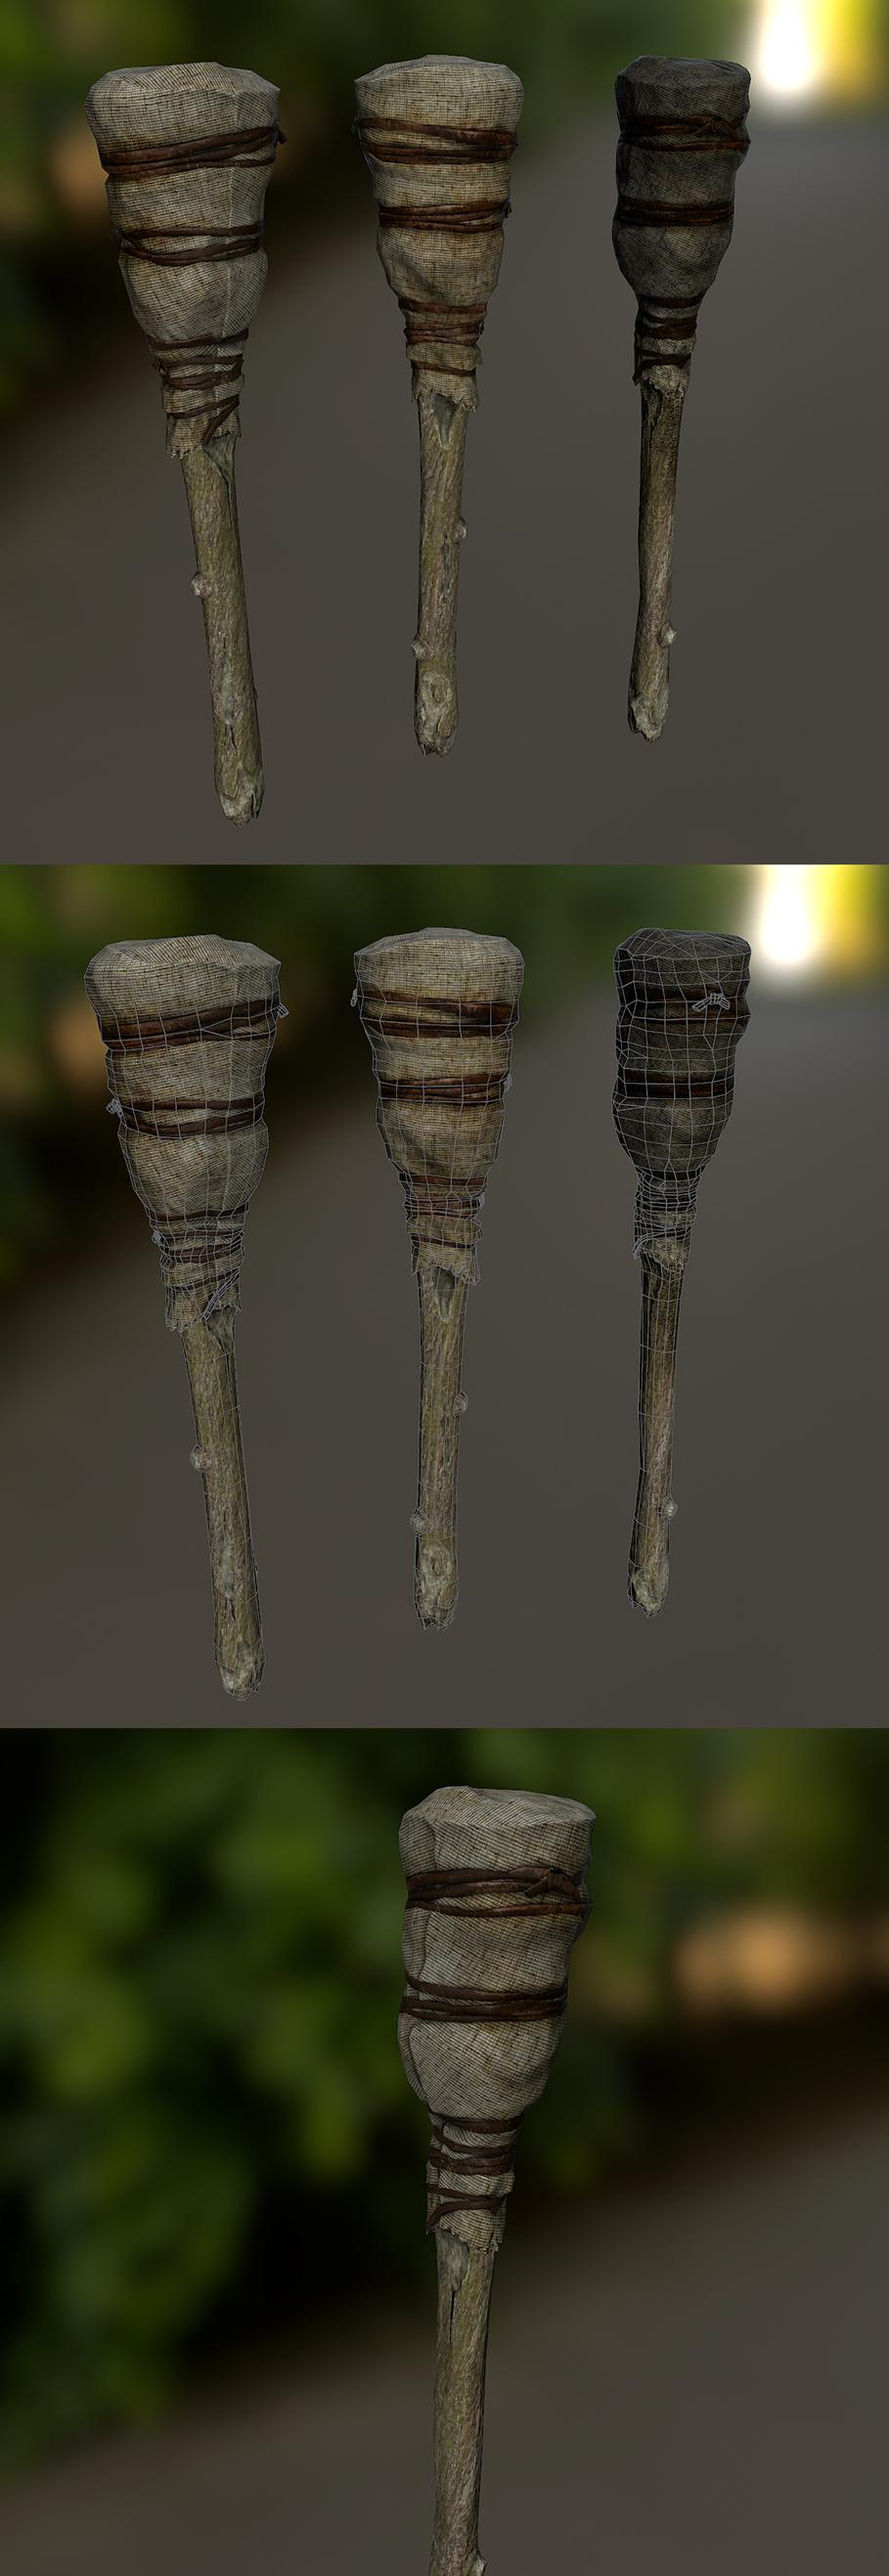 Текстуры 3D модели факела